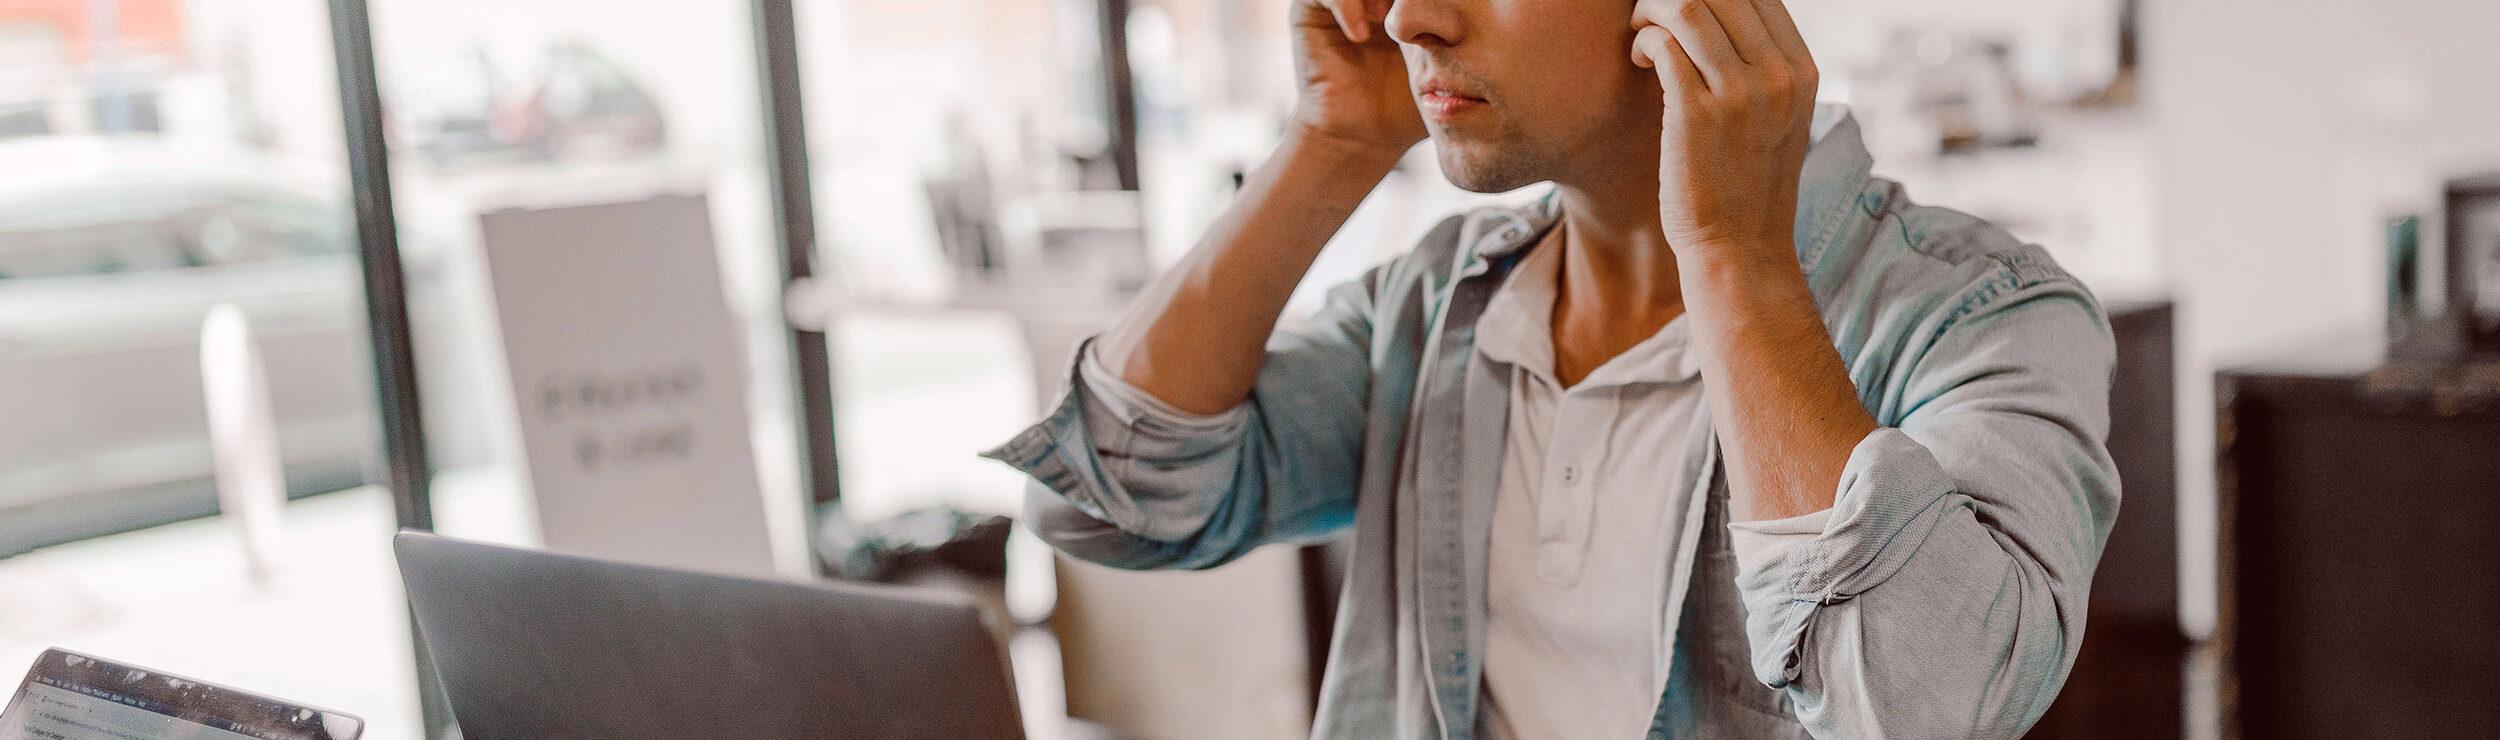 man listening on headphones carefully